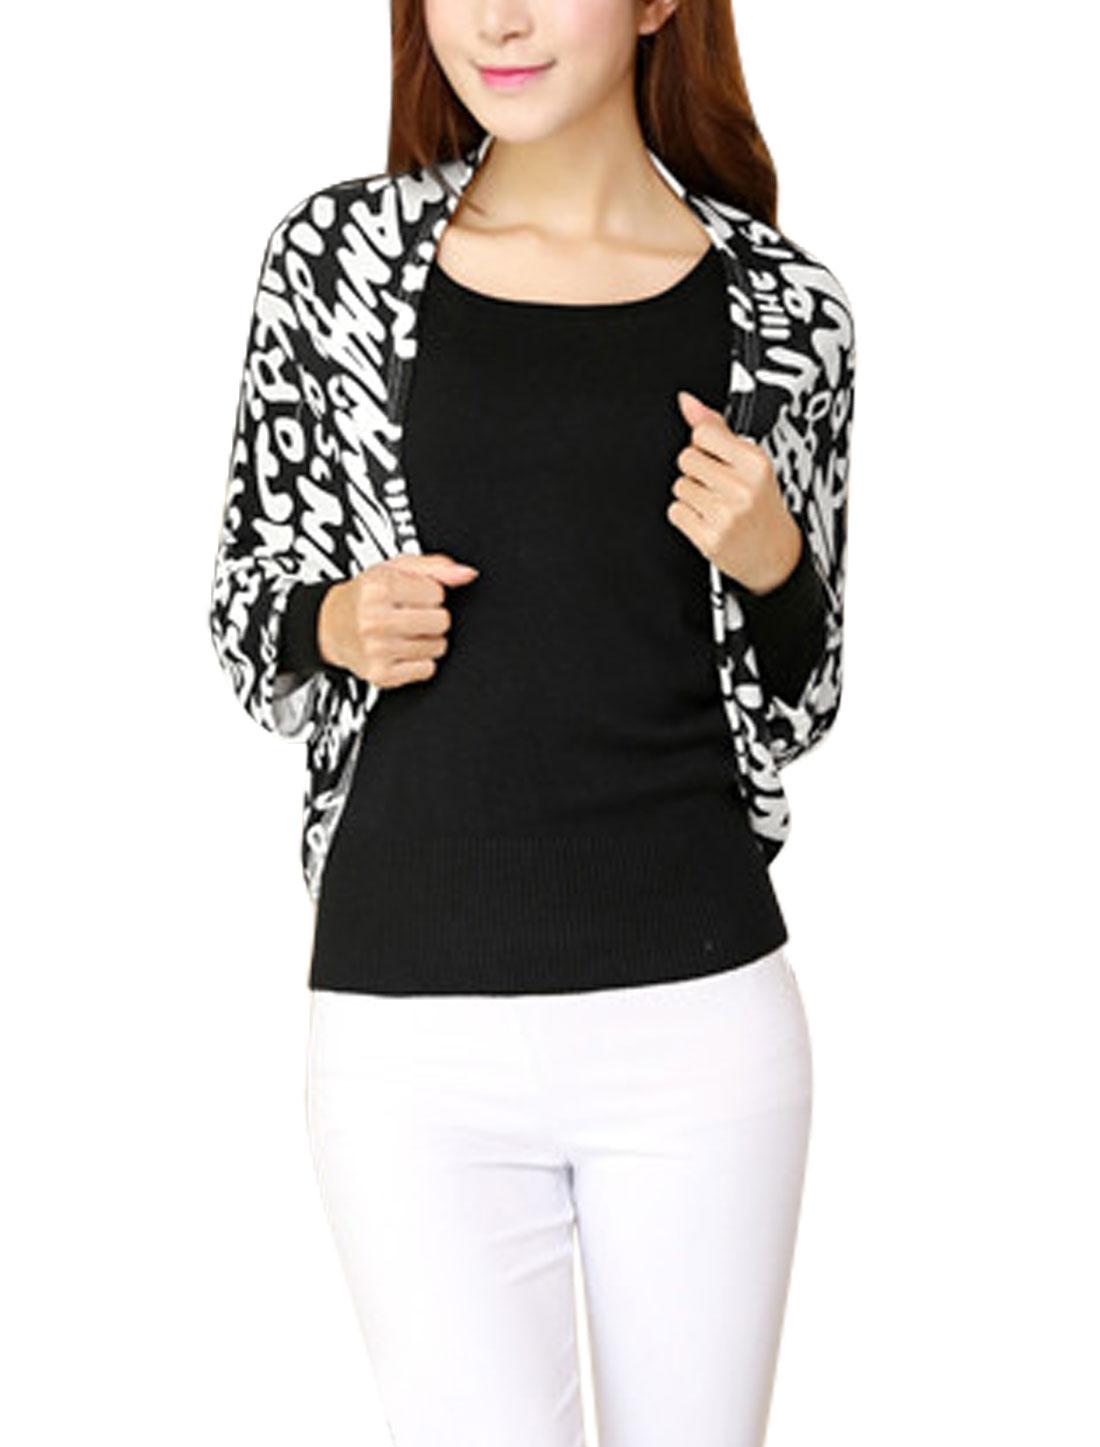 Ladies 3/4 Batwing Sleeve Cozy Fit Letters Prints Knit Shrug Black Beige XS